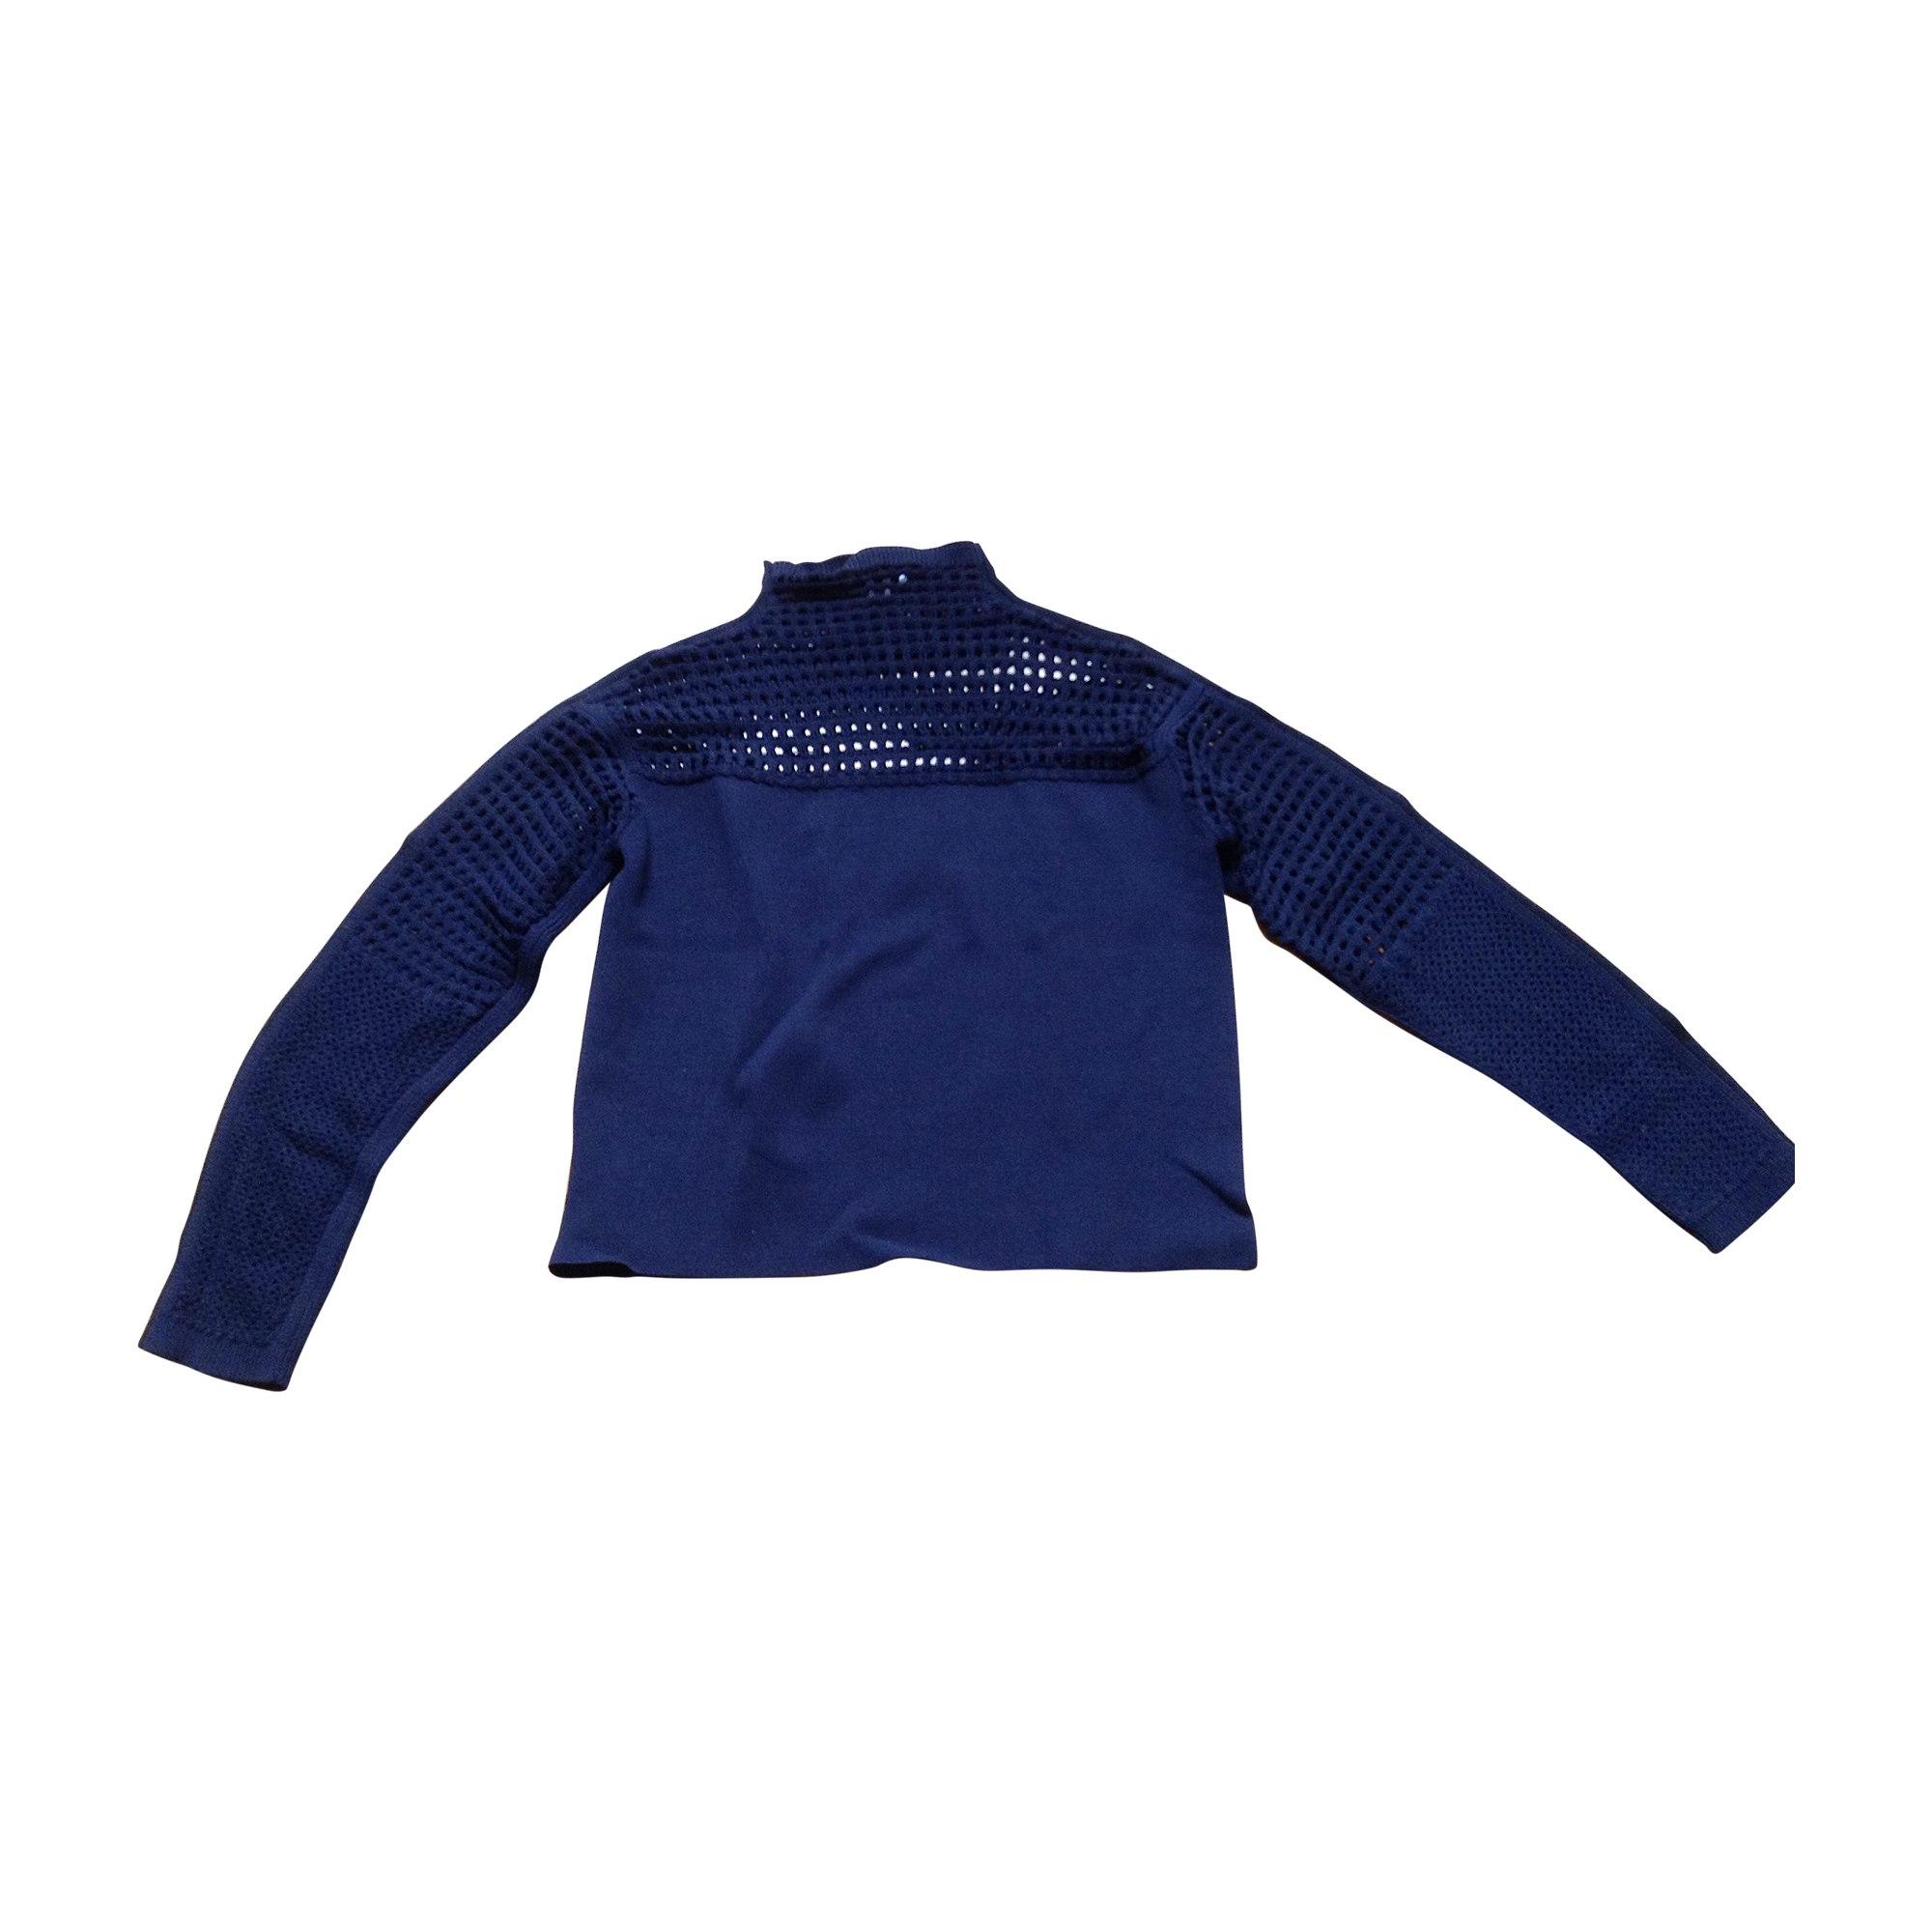 Pull HELMUT LANG Bleu, bleu marine, bleu turquoise